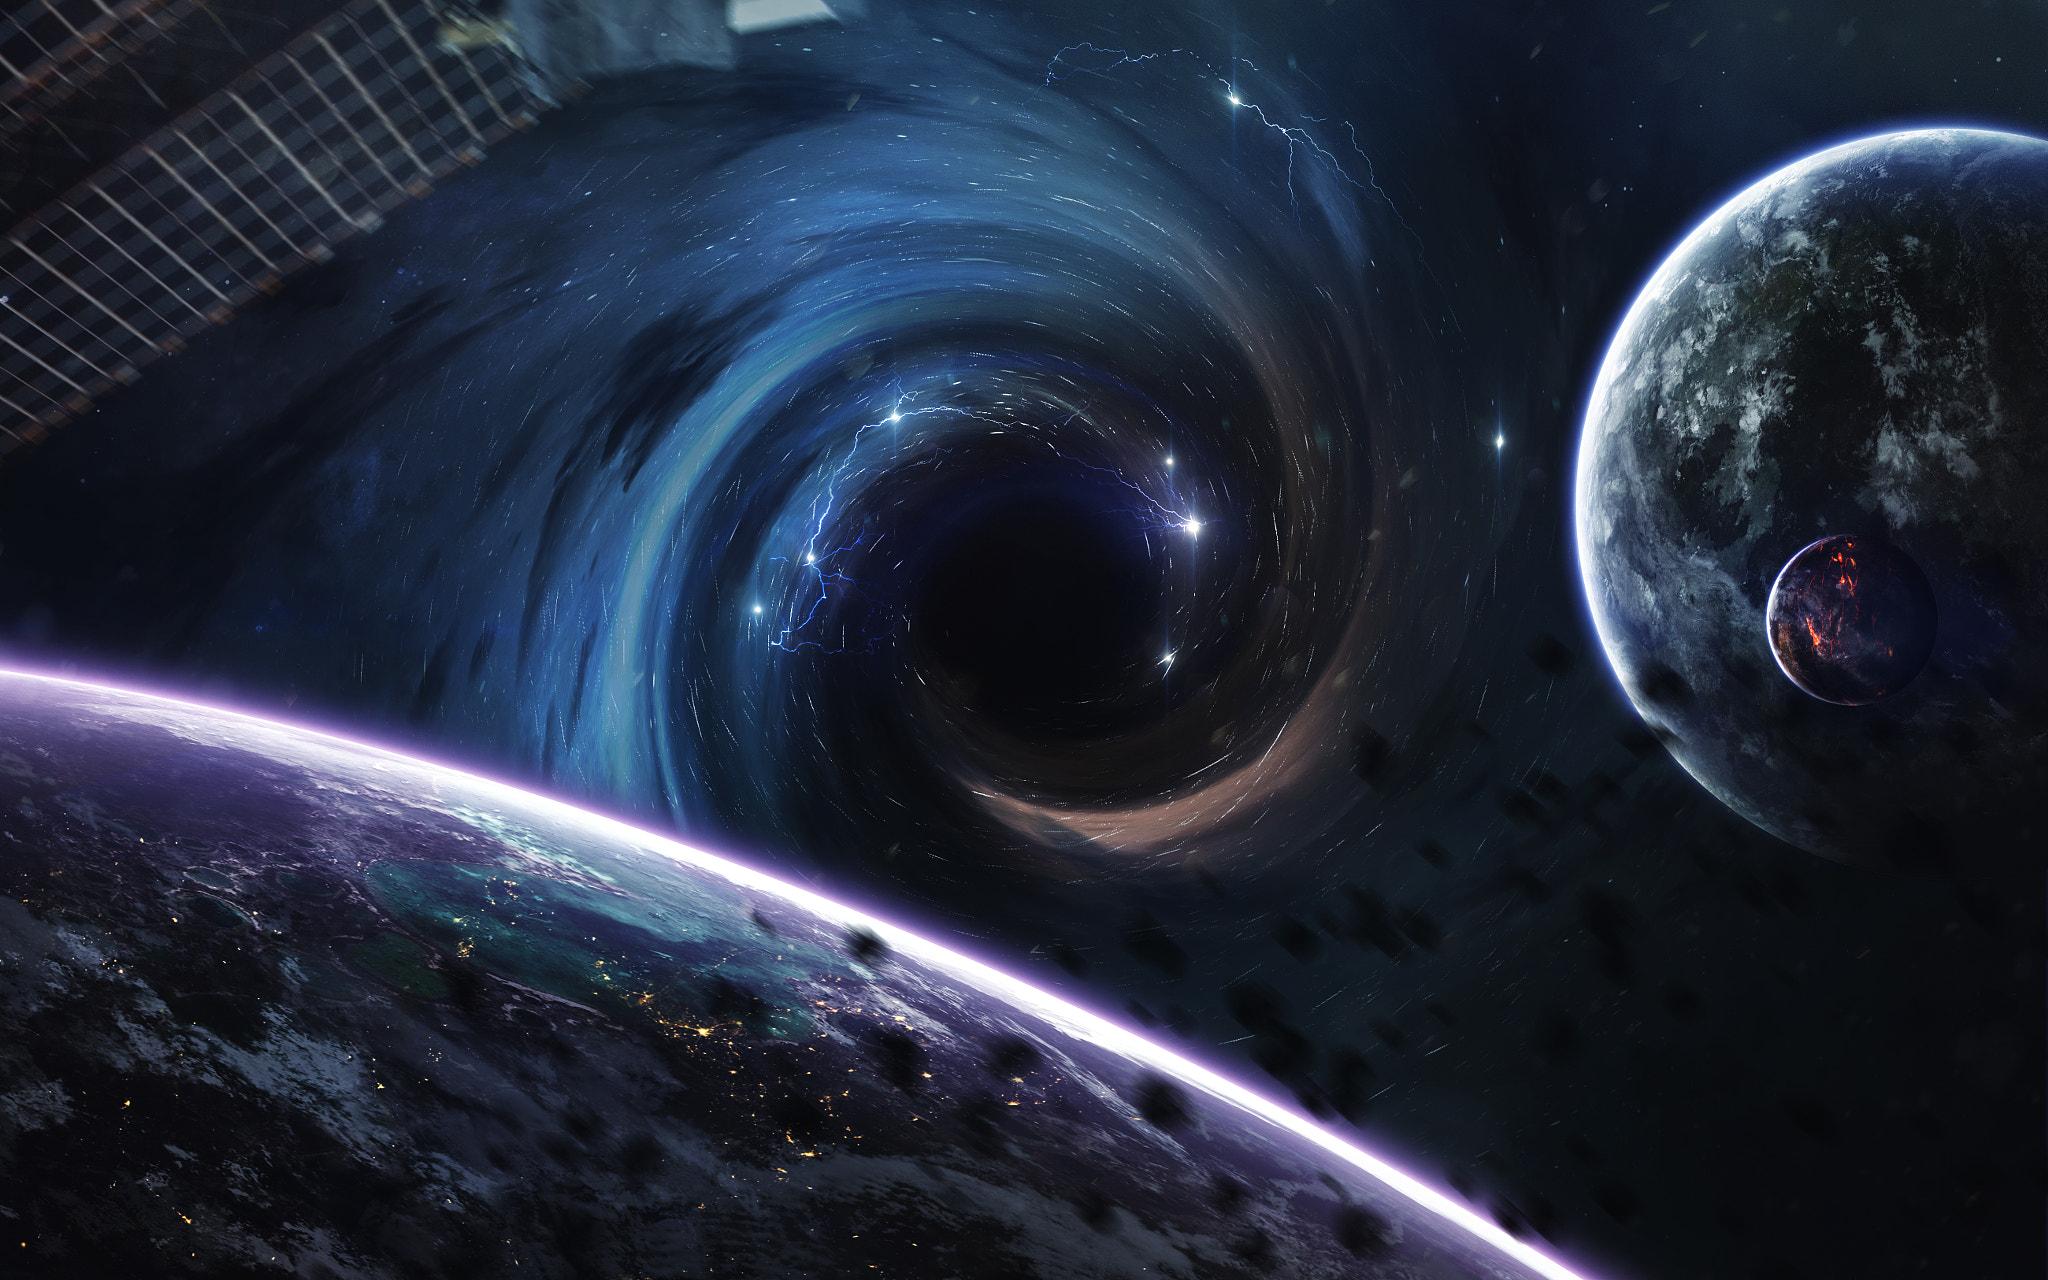 Hintergrundbilder 2048x1280 Px Black Hole Abstract Space